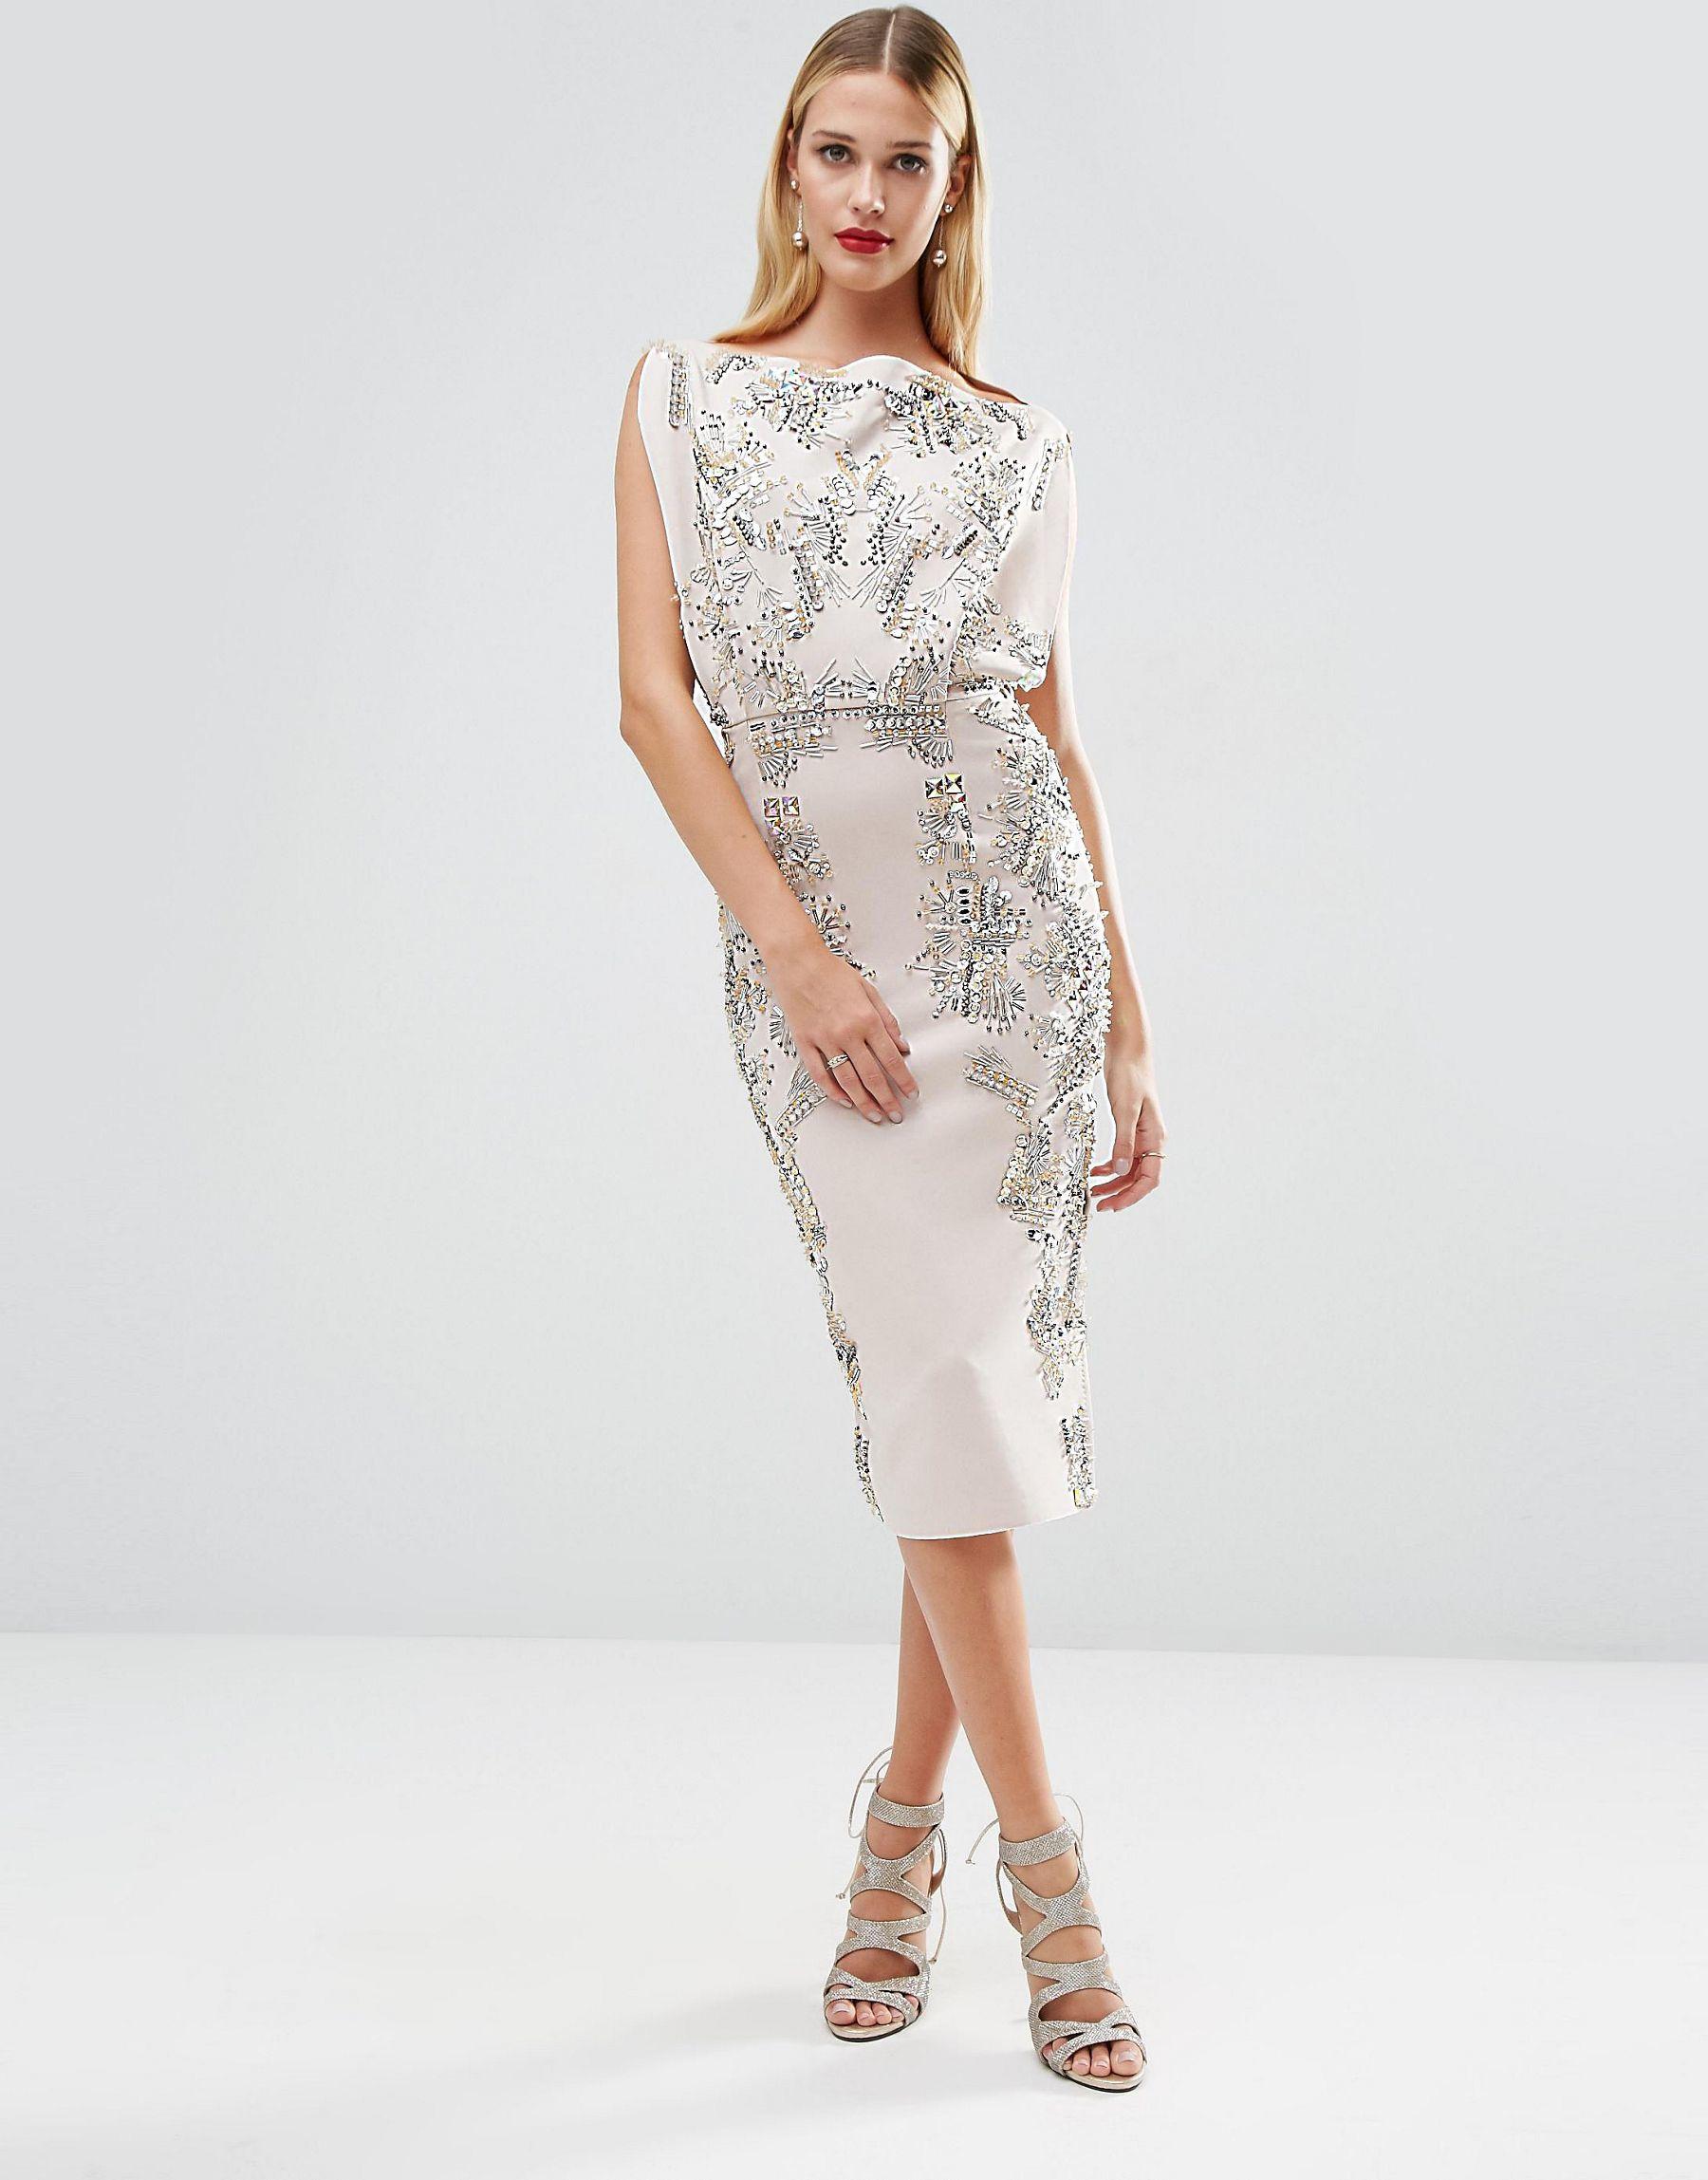 5998b695e26 ASOS Red Carpet Open Top Scuba Embellished Midi Dress - Lyst